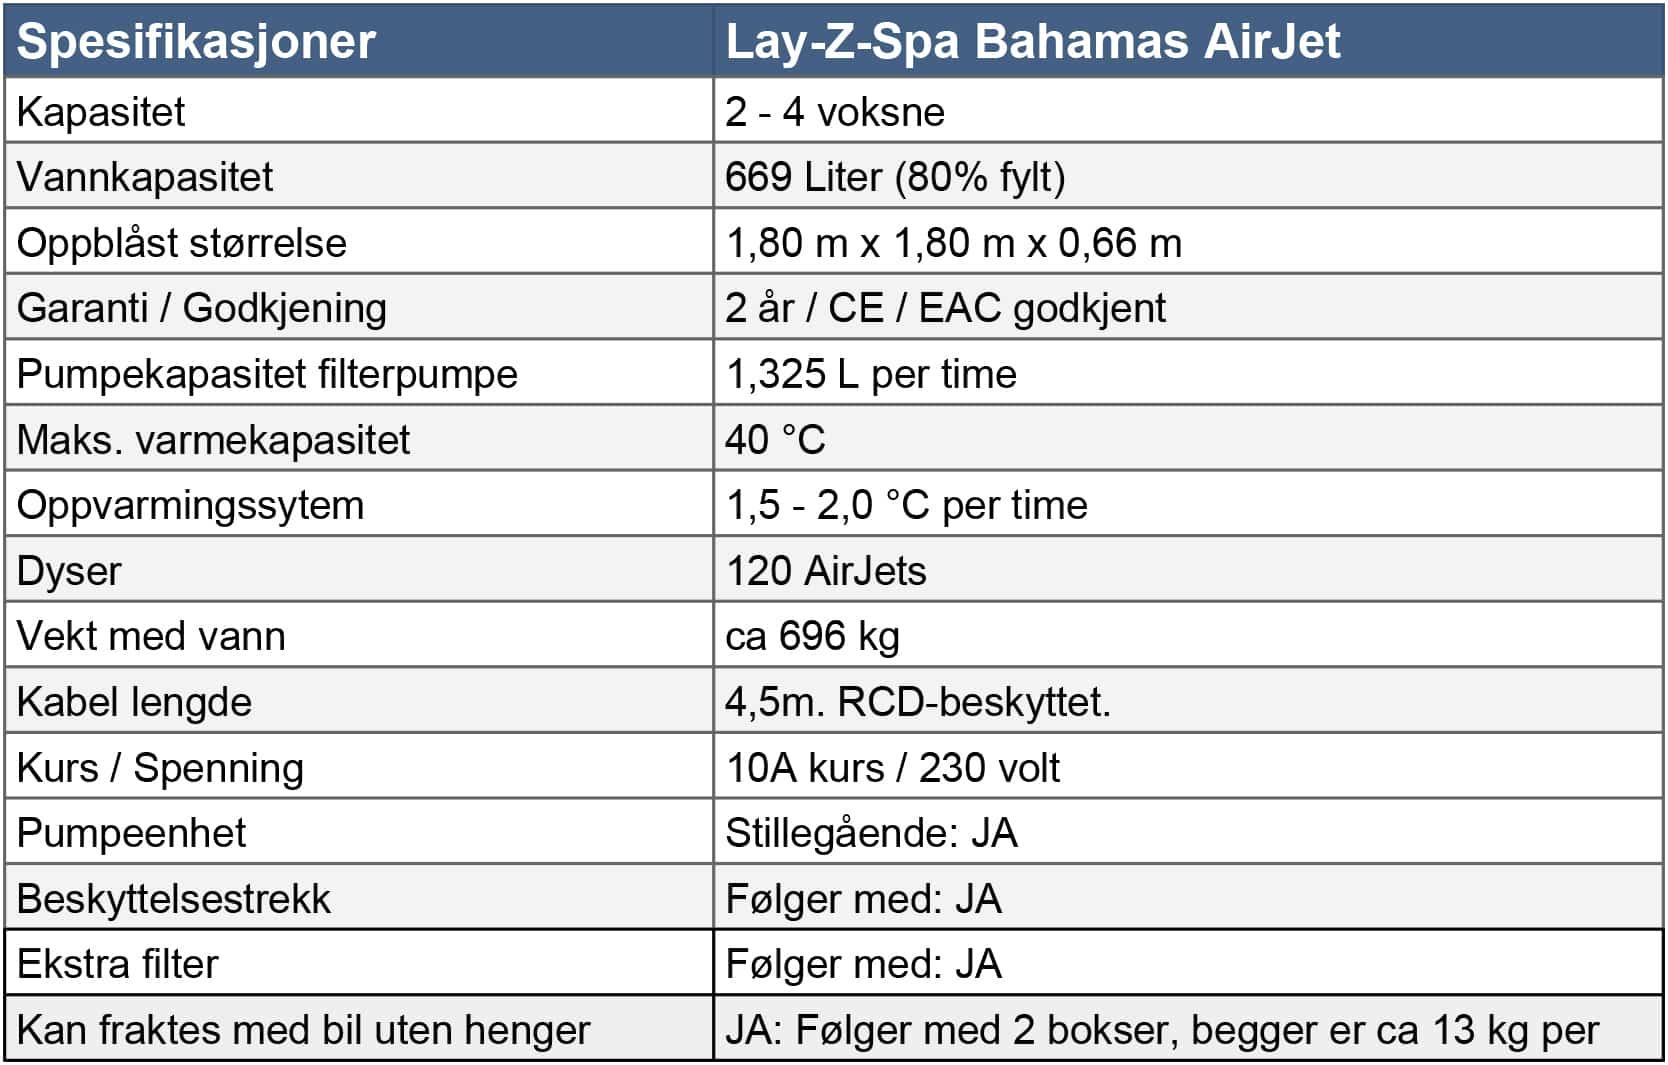 Spesifikasjoner Lay-Z-Spa Bahamas AirJet